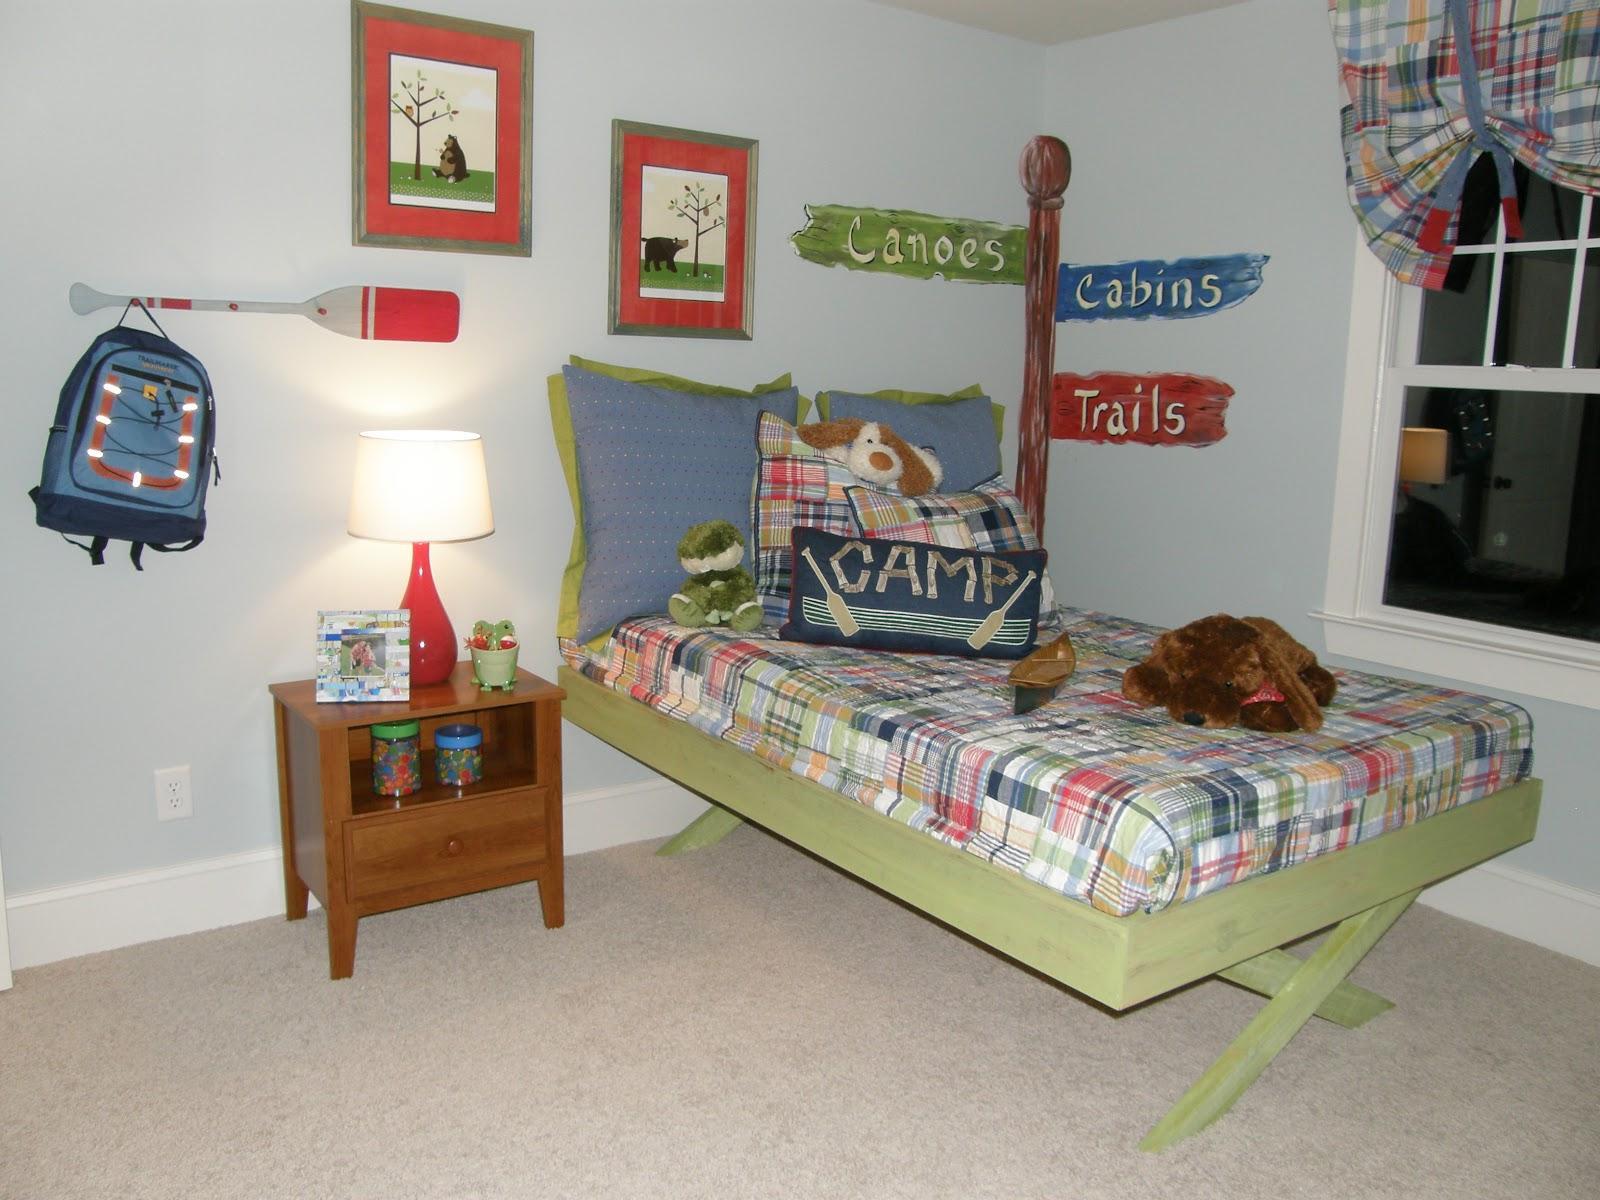 Happy camper room design dazzle for Camping room decor